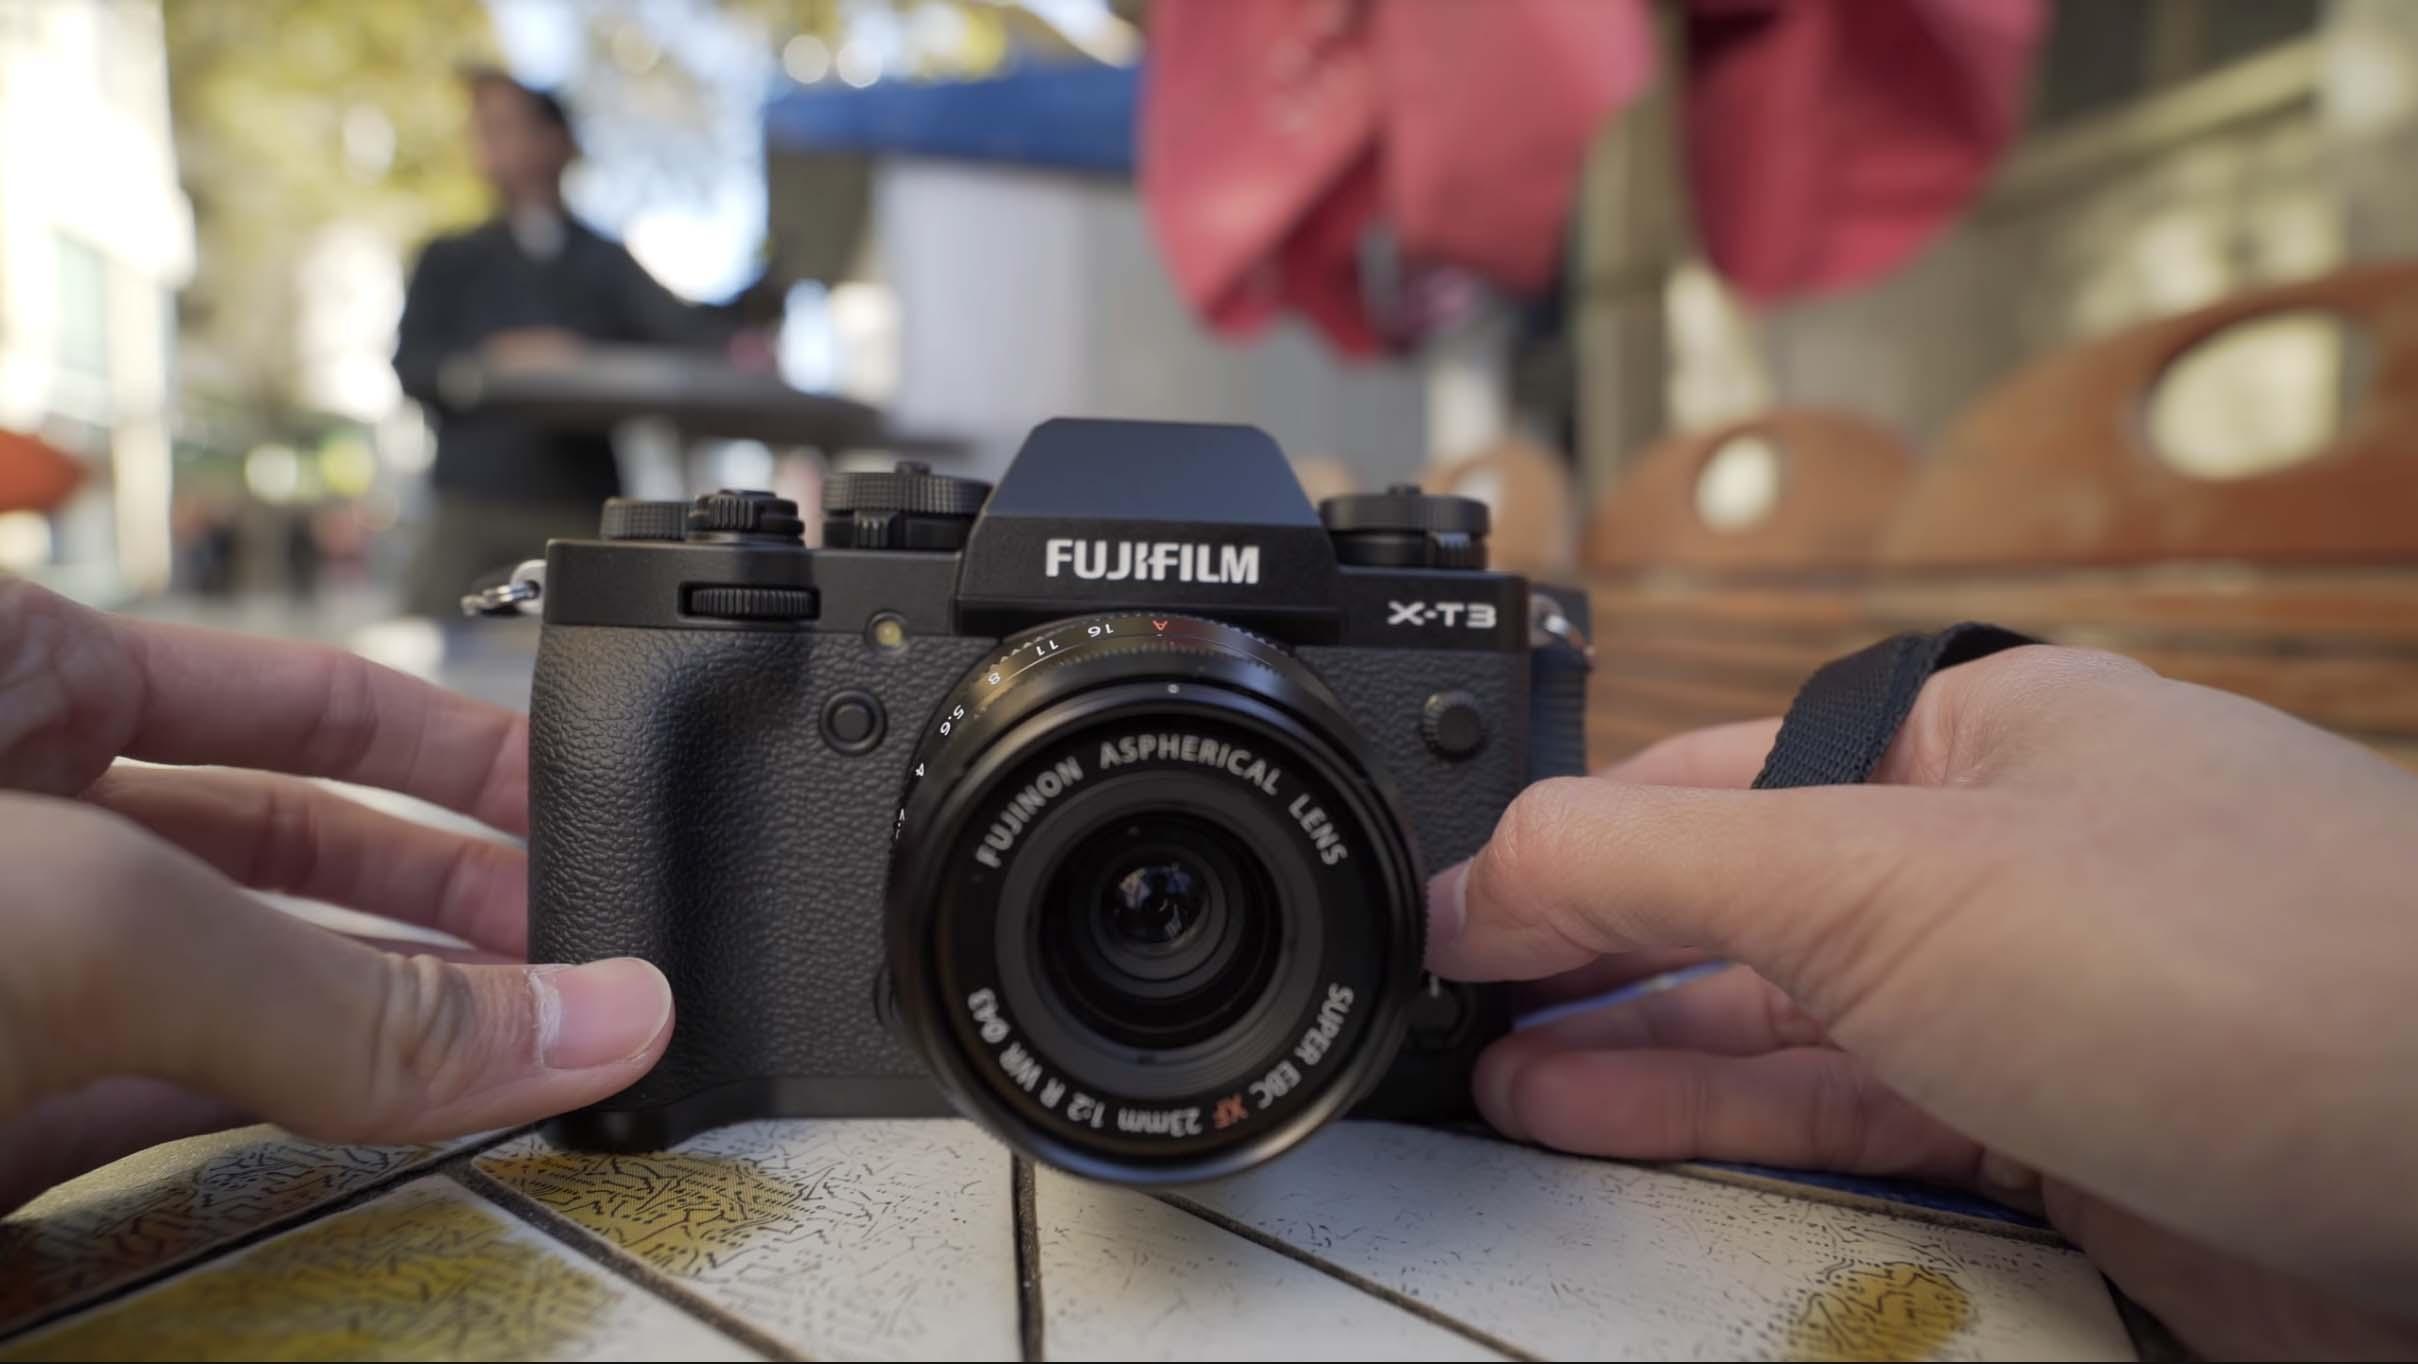 Fujifilm X-T3 Roundup: Fujifilm vs The Competition, Capture One